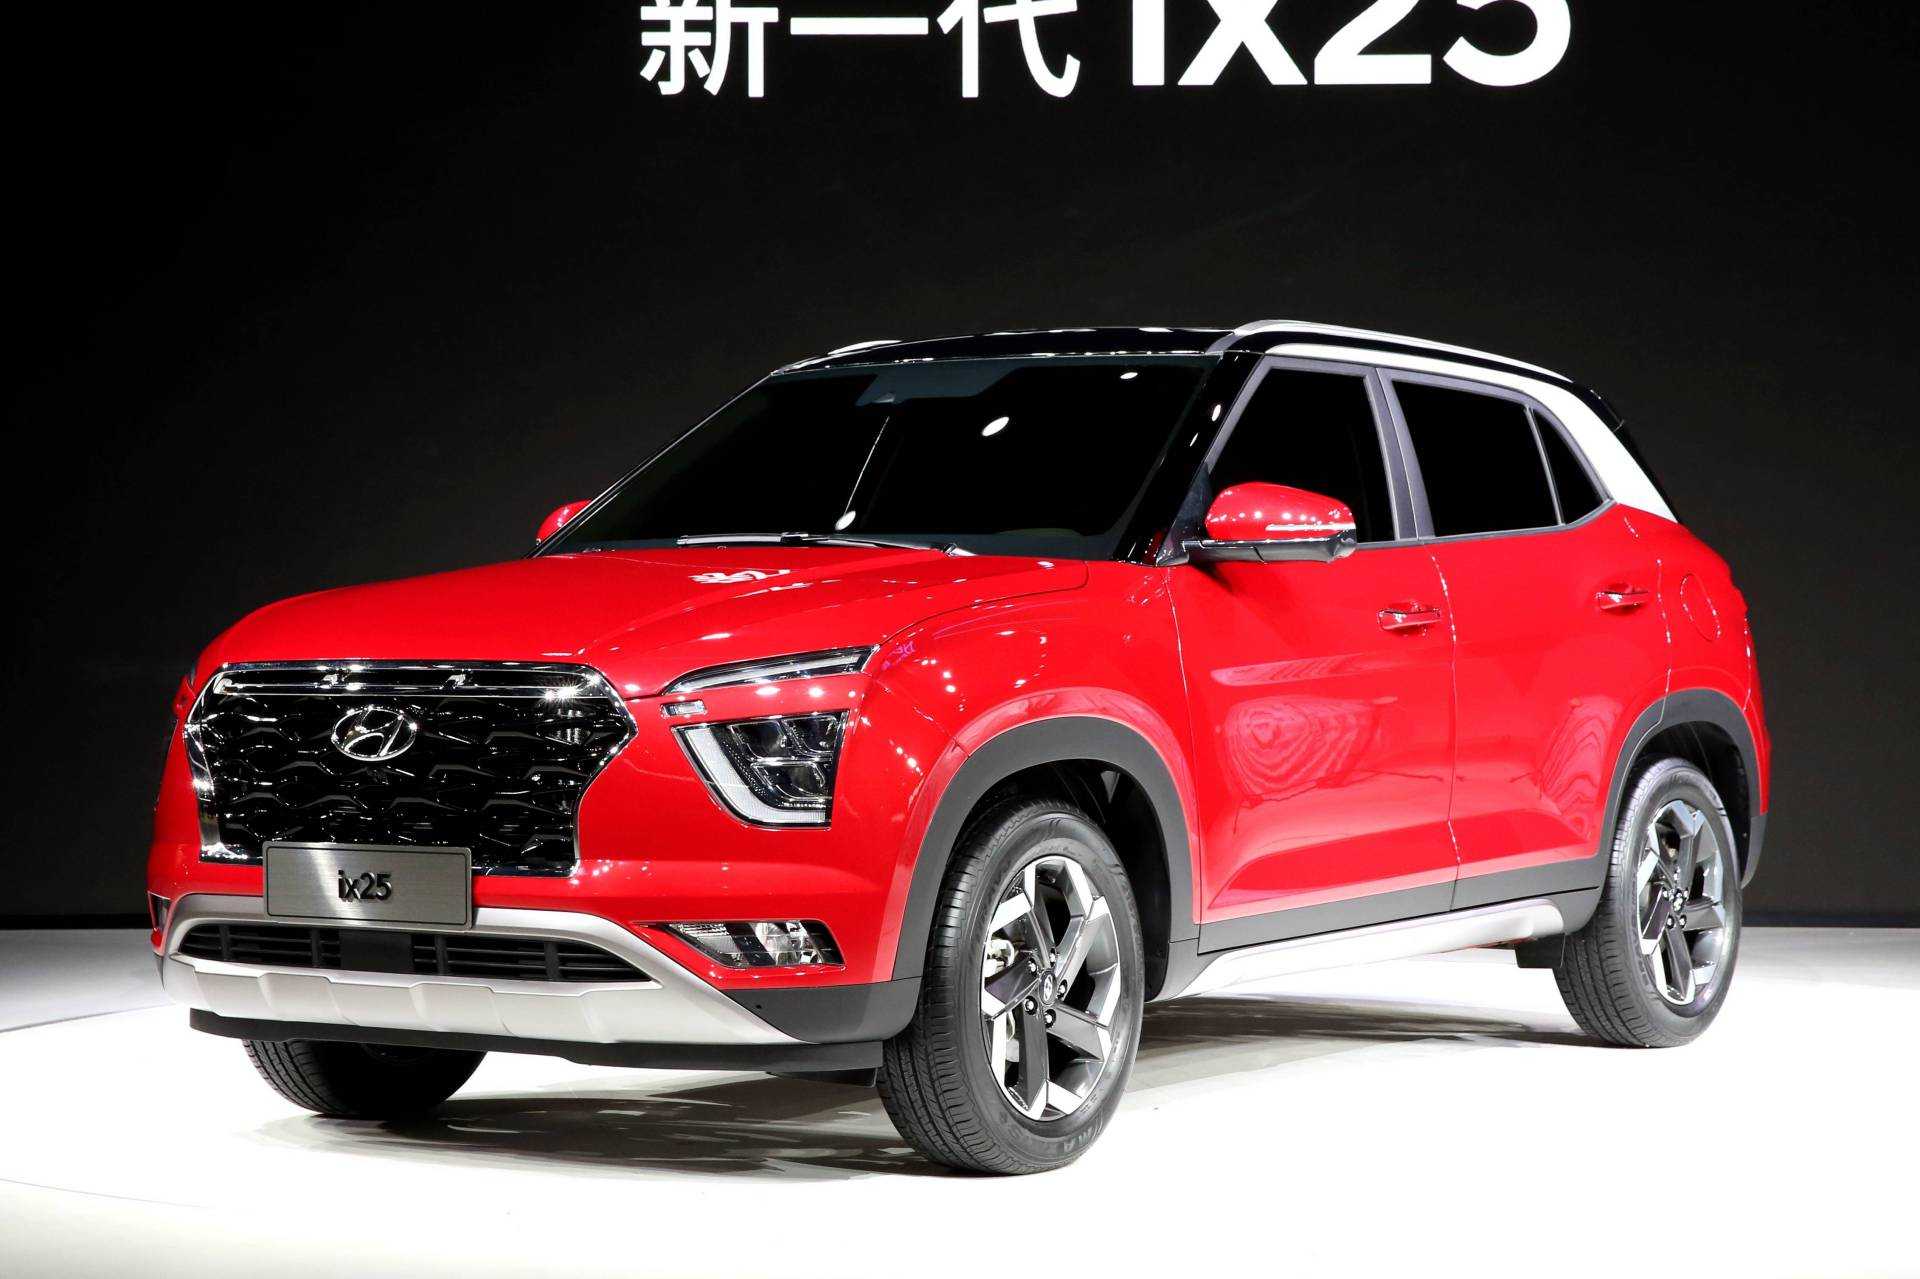 Hyundai Venue: Here's the littlest Hyundai SUV